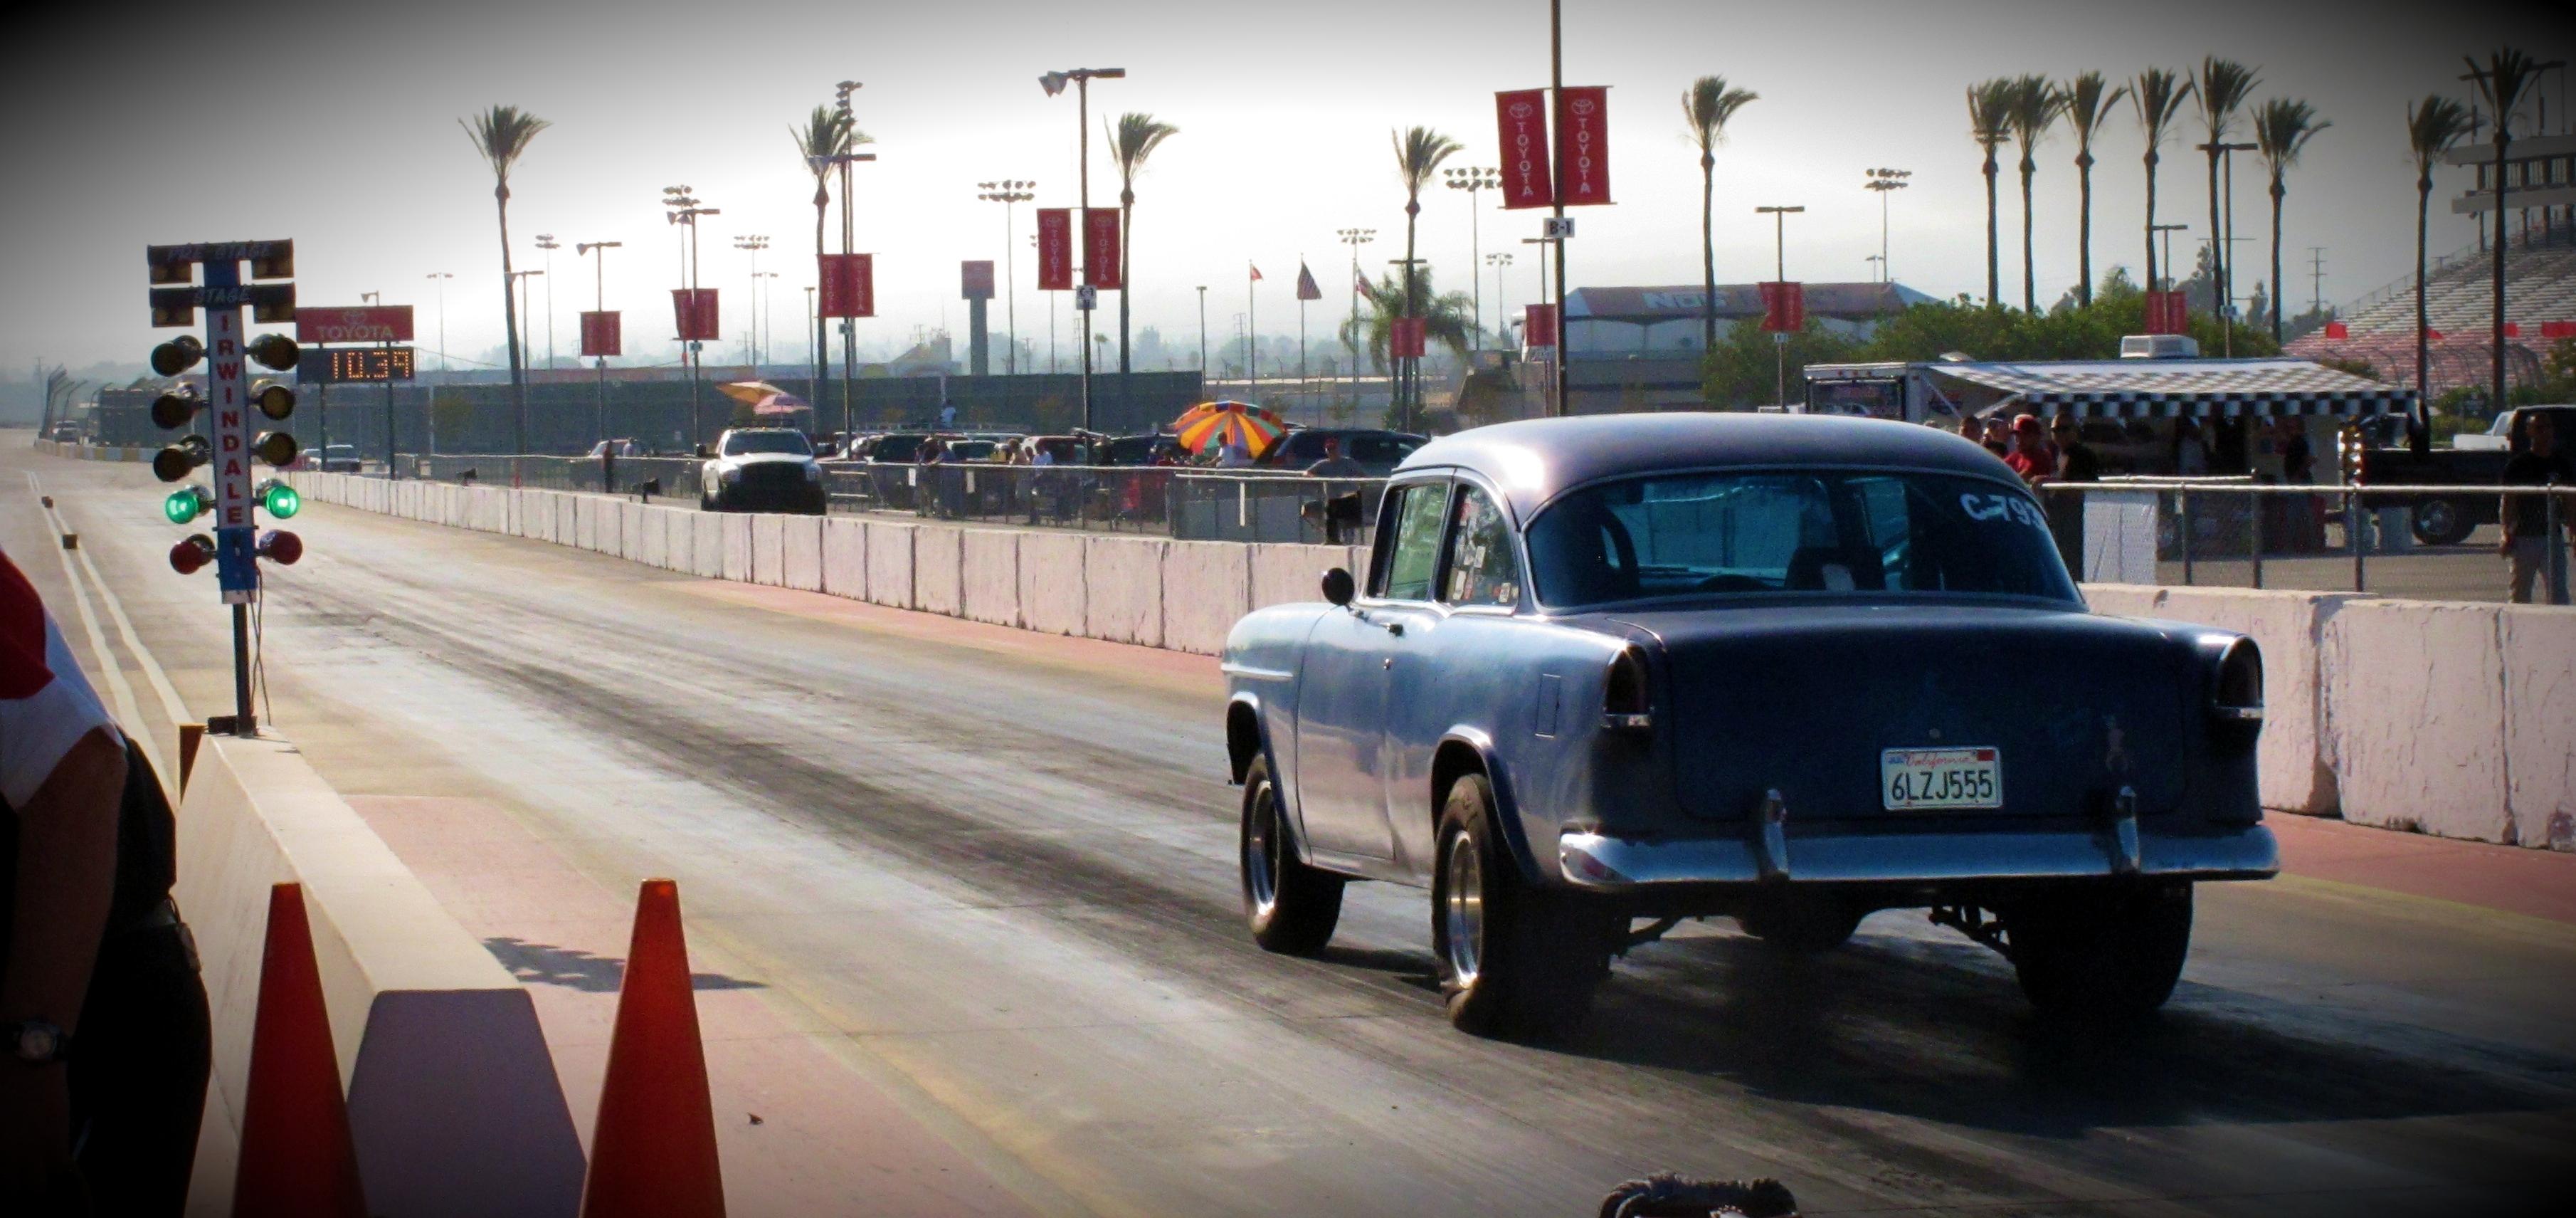 amateur drag racing, Irwindale Speedway, toyota speedway